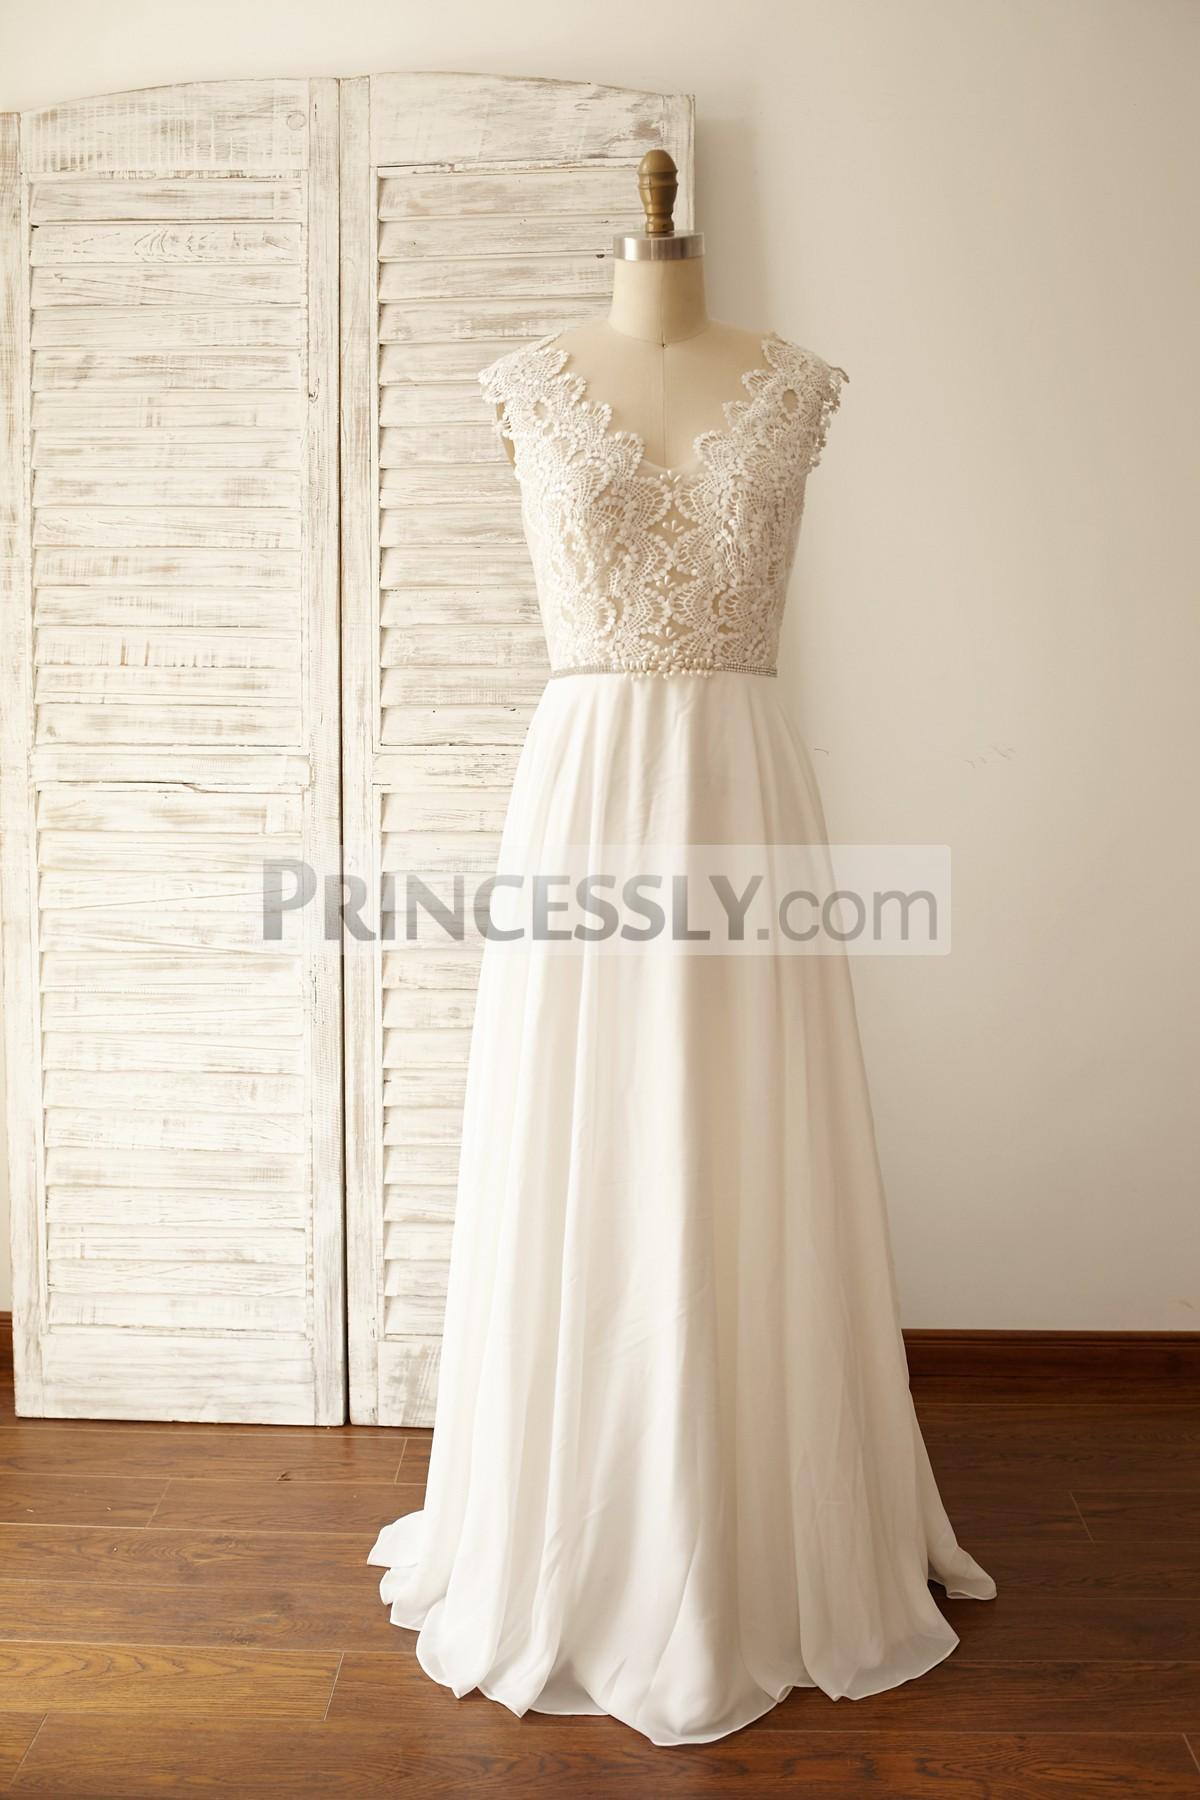 Princessly.com-K1000058-Sheer Lace Deep V Back Chiffon Wedding Dress-31